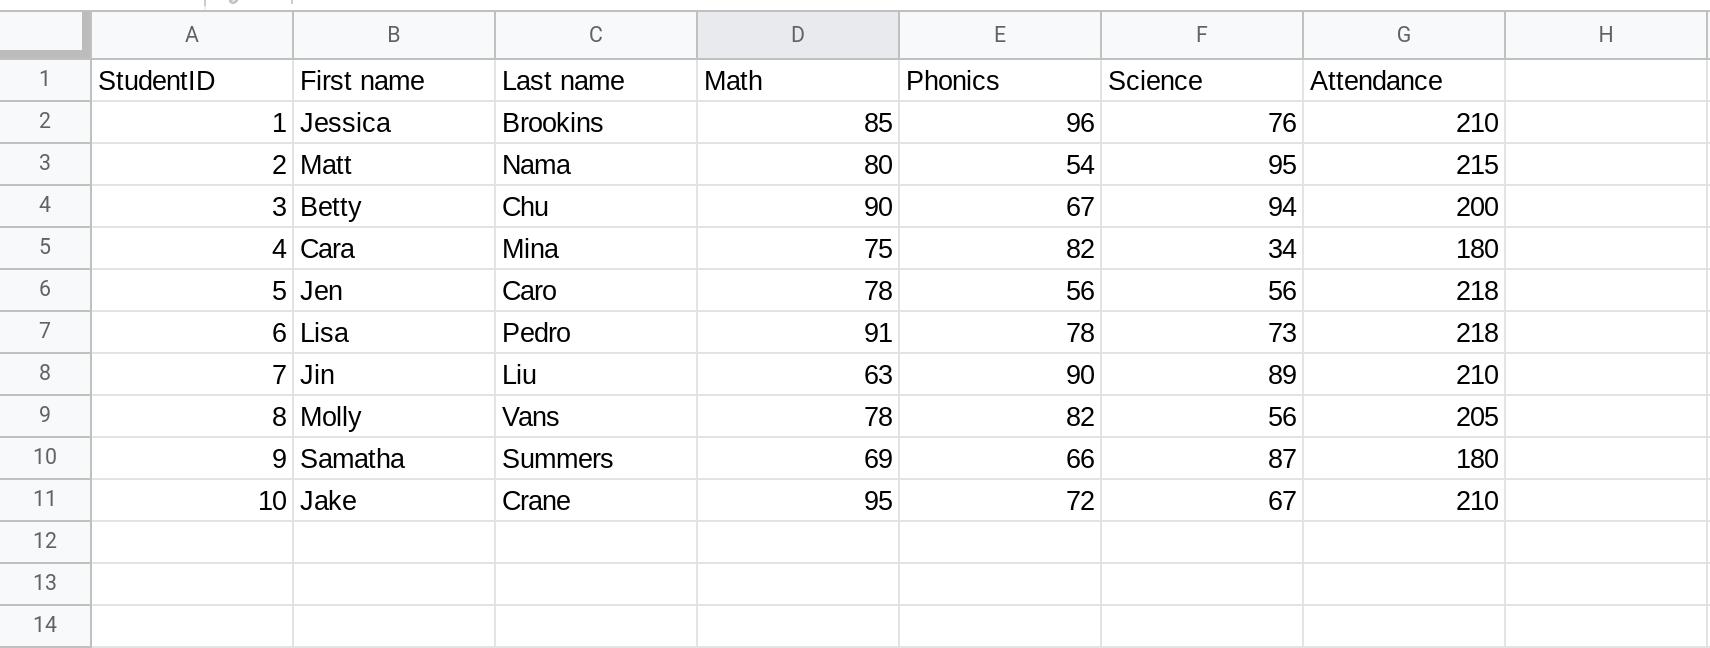 Screenshot of a Google Sheets spreadsheet containing tabular data.